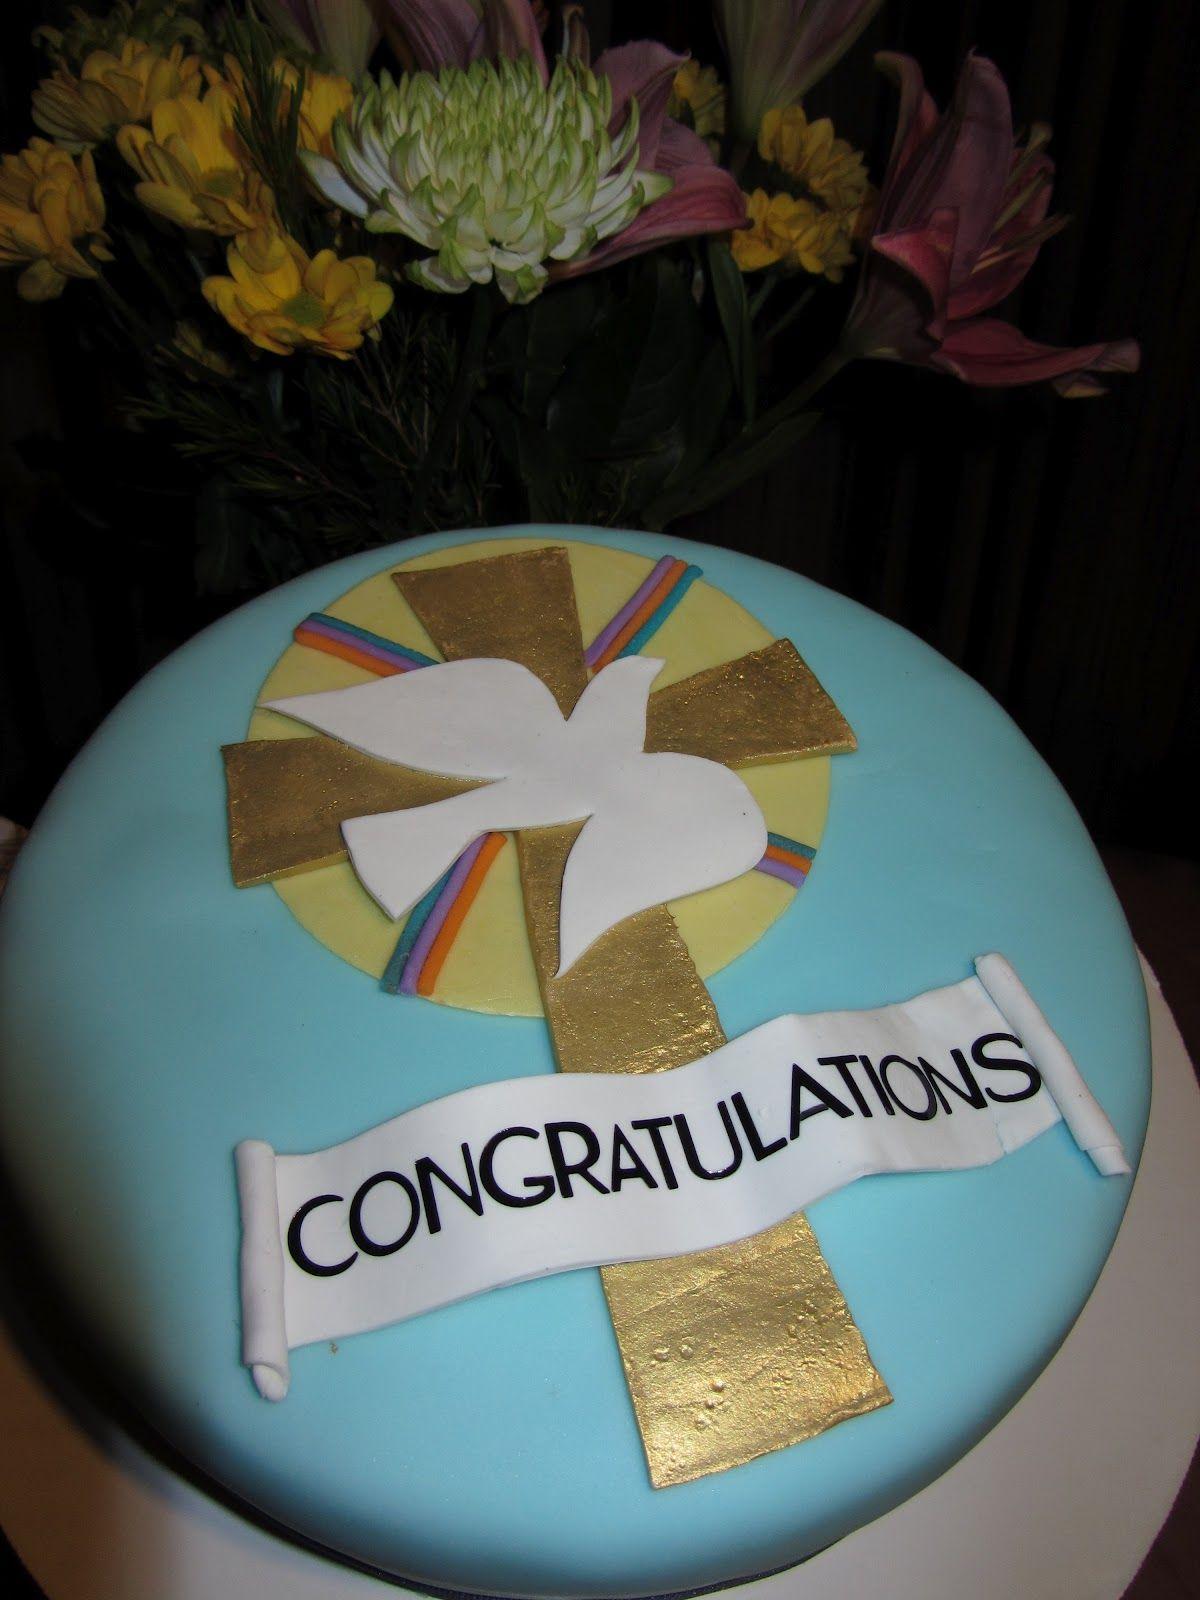 Confirmation cake | Cakes | Confirmation cakes, Religious